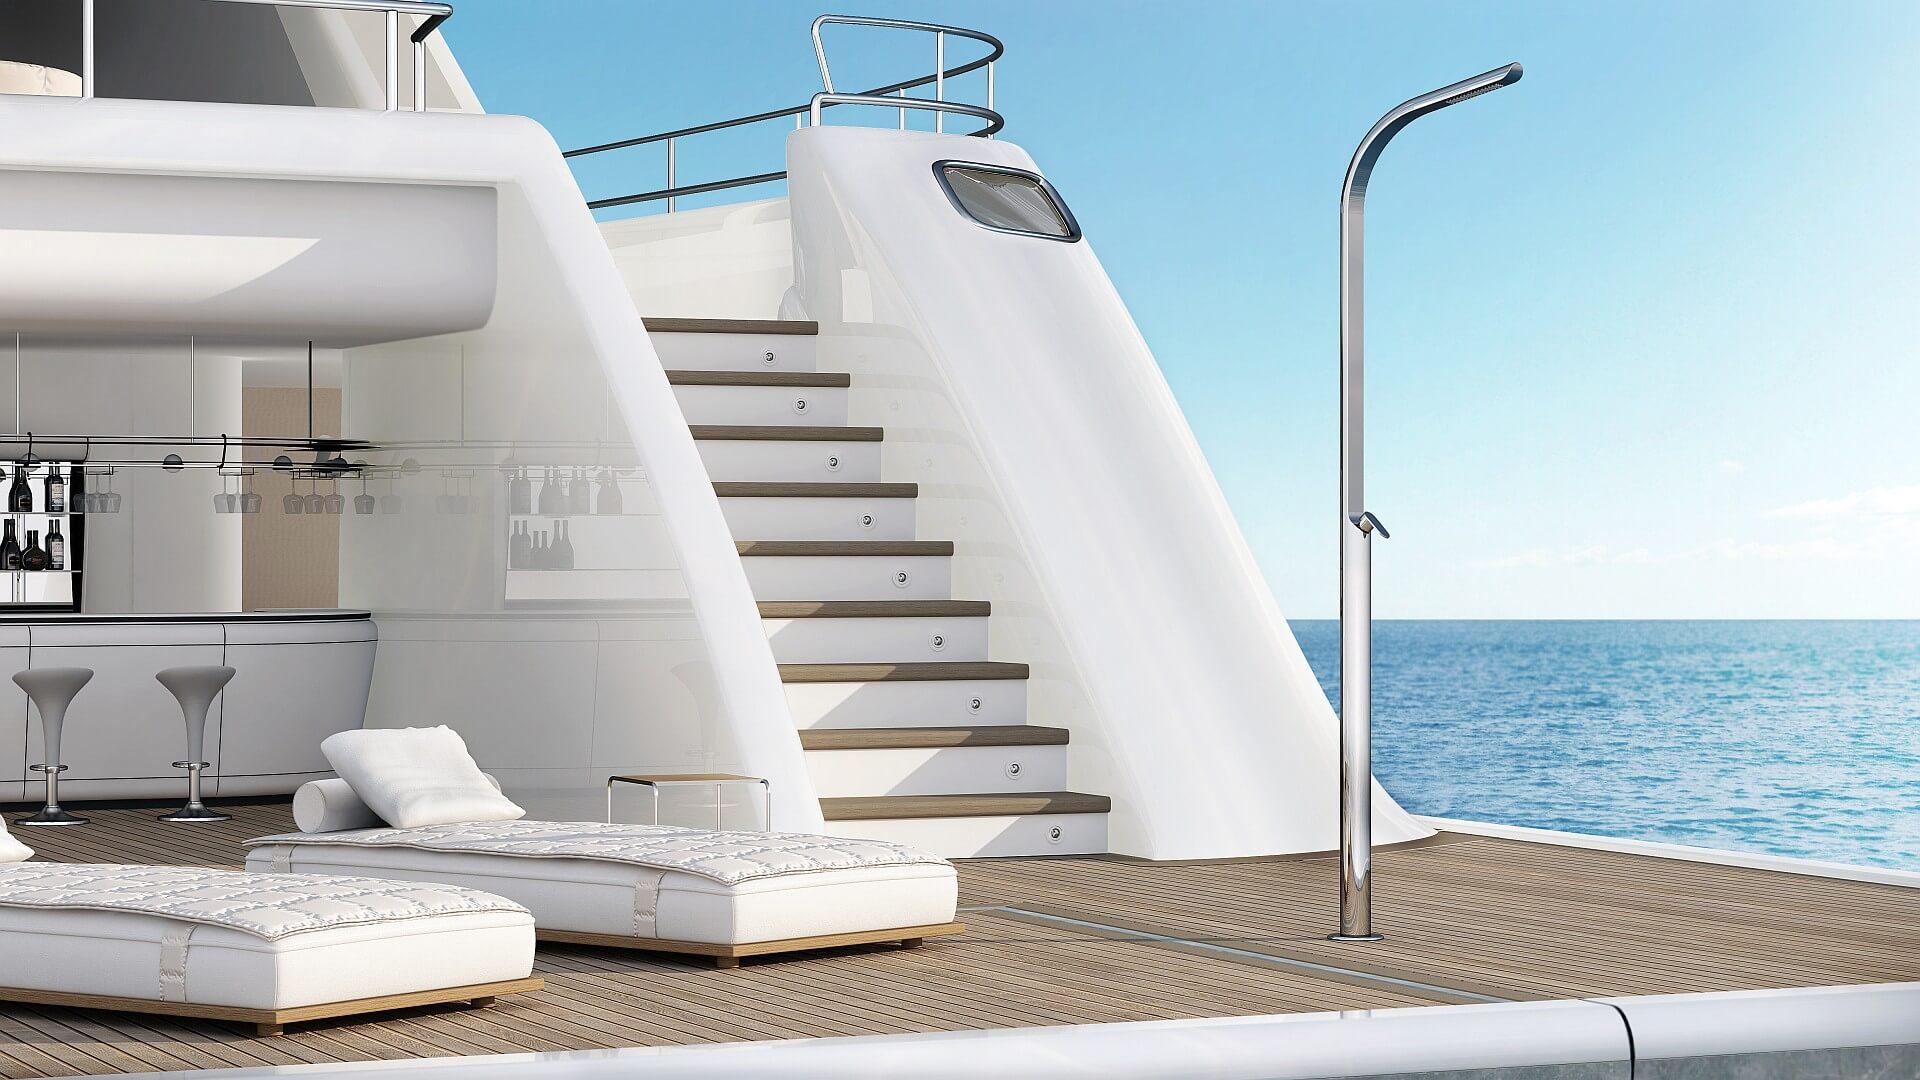 Photo douche extérieure, piscine, jardin - Dream Yacht Inoxstyle